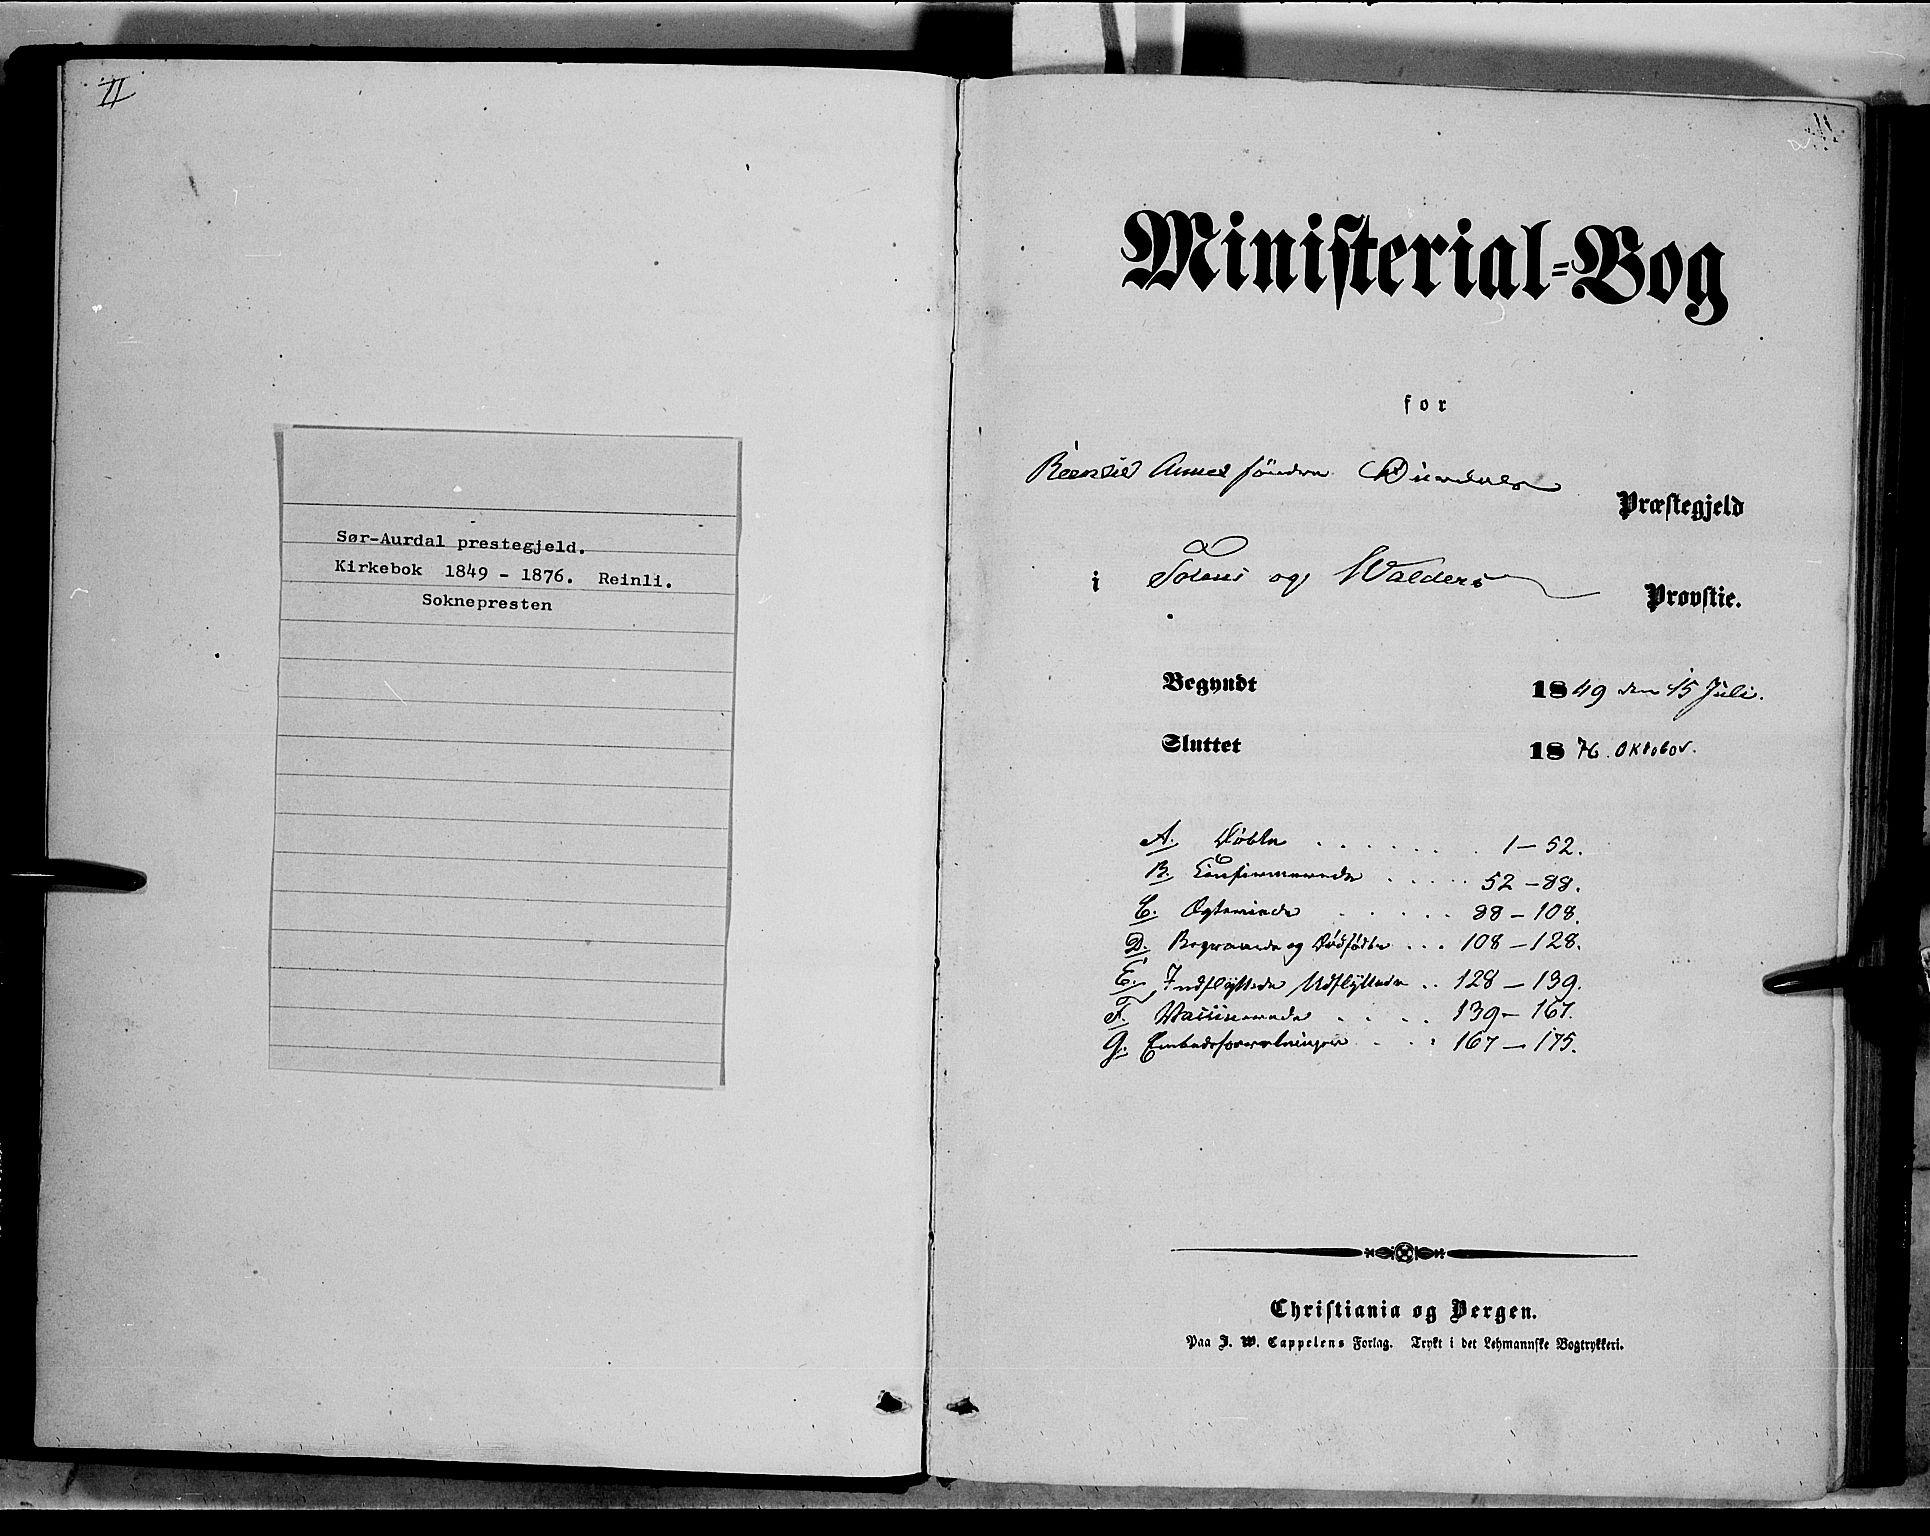 SAH, Sør-Aurdal prestekontor, Ministerialbok nr. 6, 1849-1876